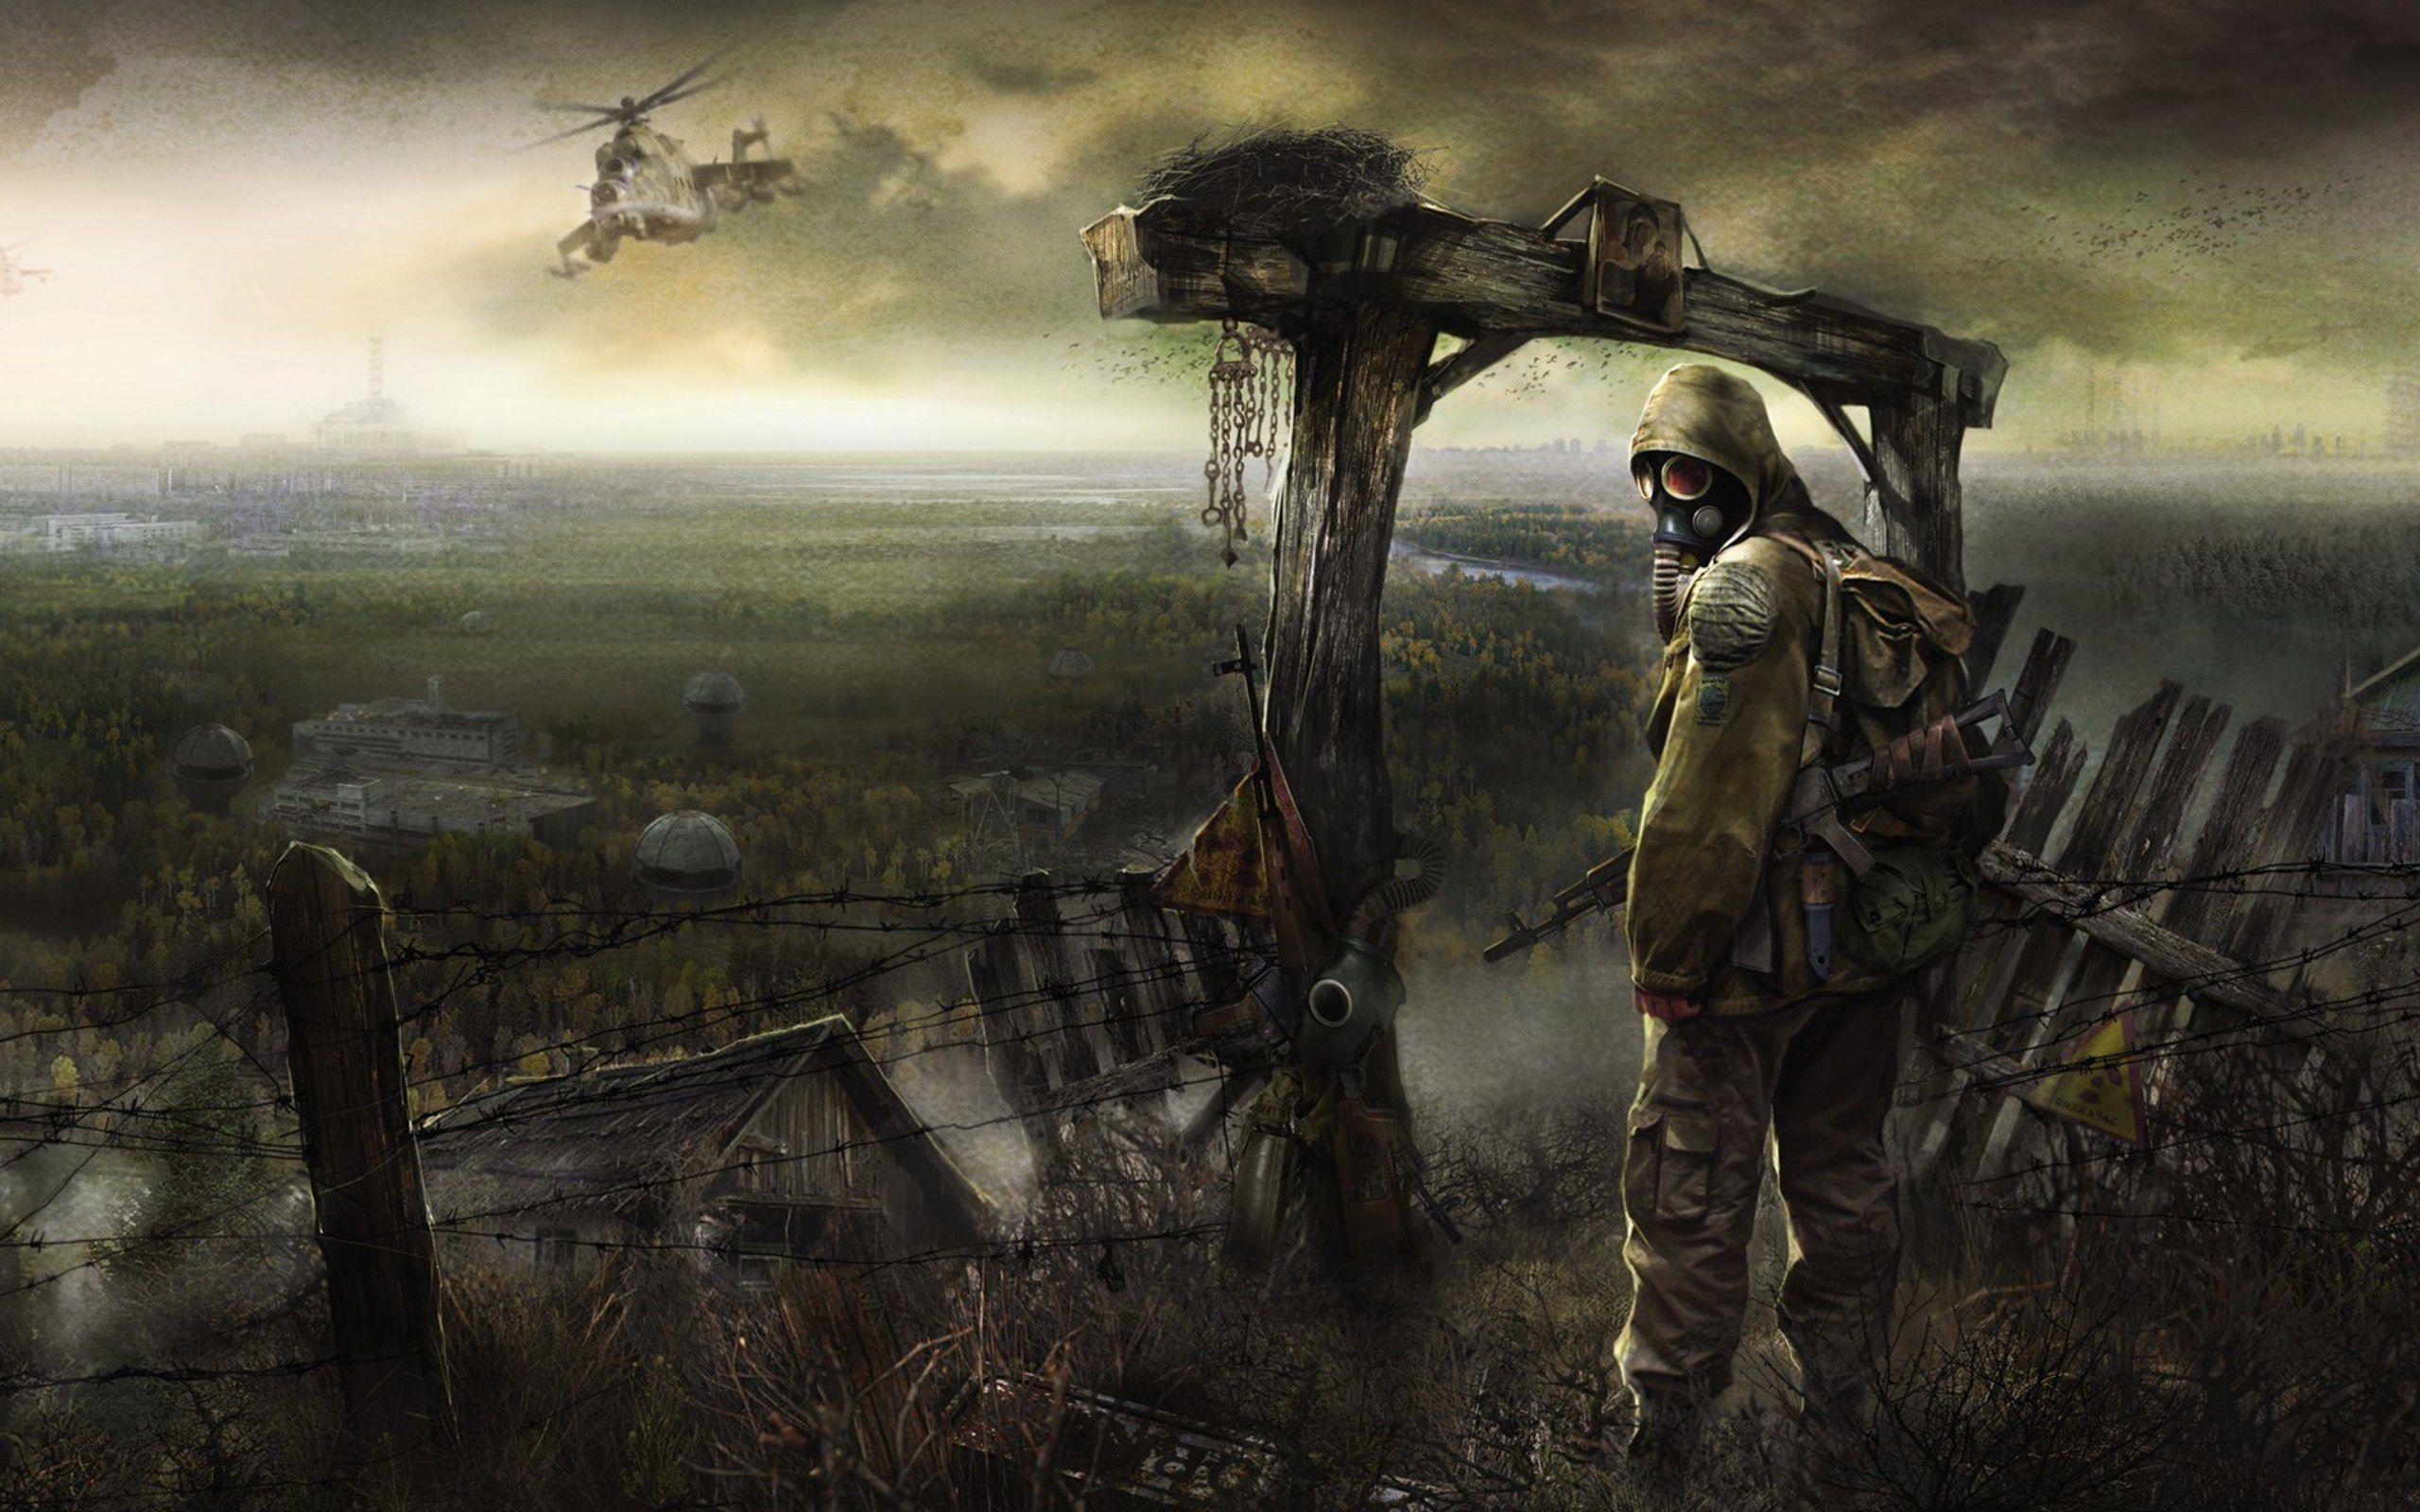 2560x1600 Wallpapers Free Stalker Apocalypse Art Chernobyl Post Apocalyptic